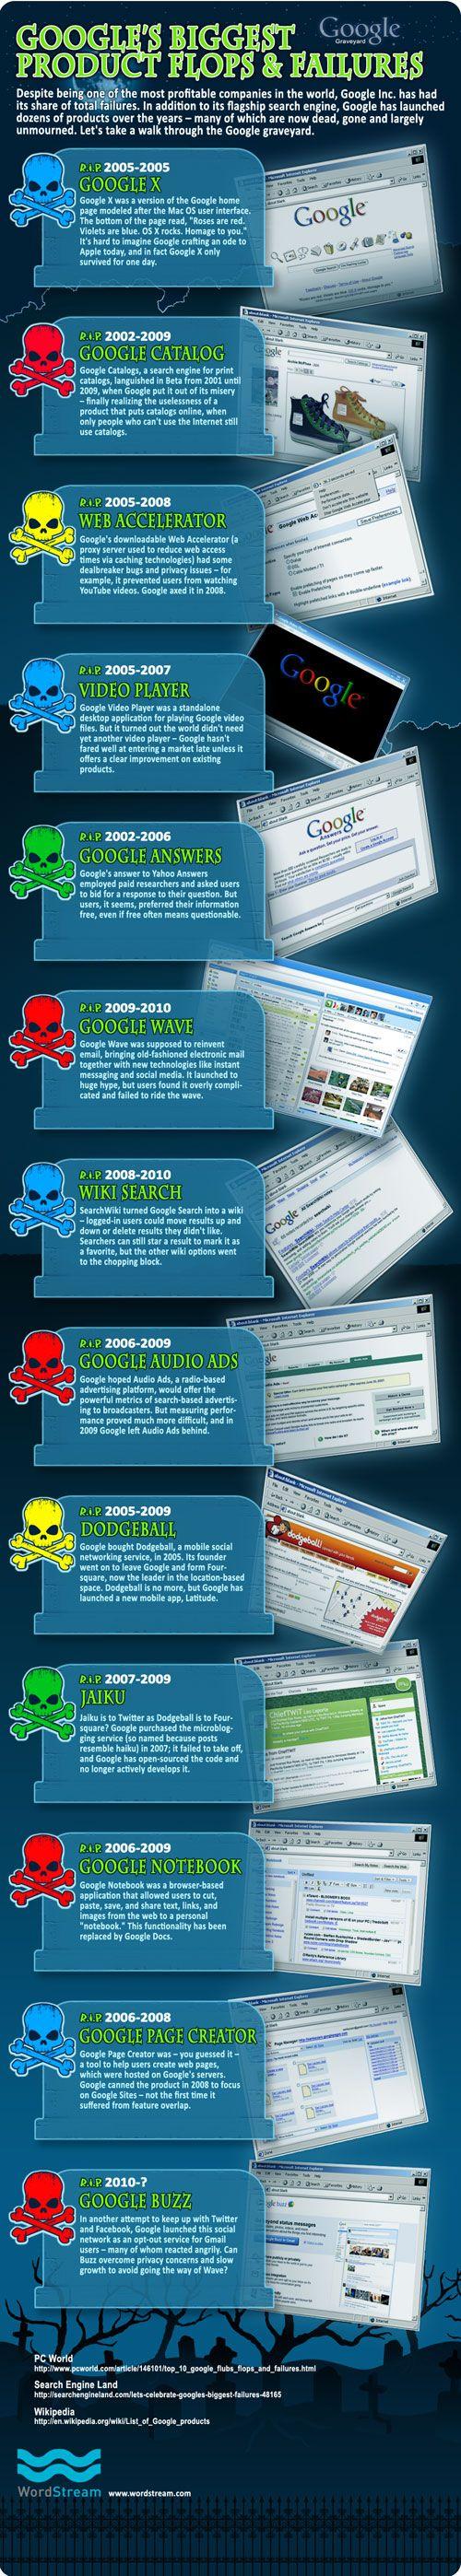 Google Flops & Failures - The Failed Google GraveyardGoogle Failure, Google Biggest, Biggest Flops, Google Flops, Social Media, Google Graveyards, Google'S Biggest, Socialmedia, Infographic